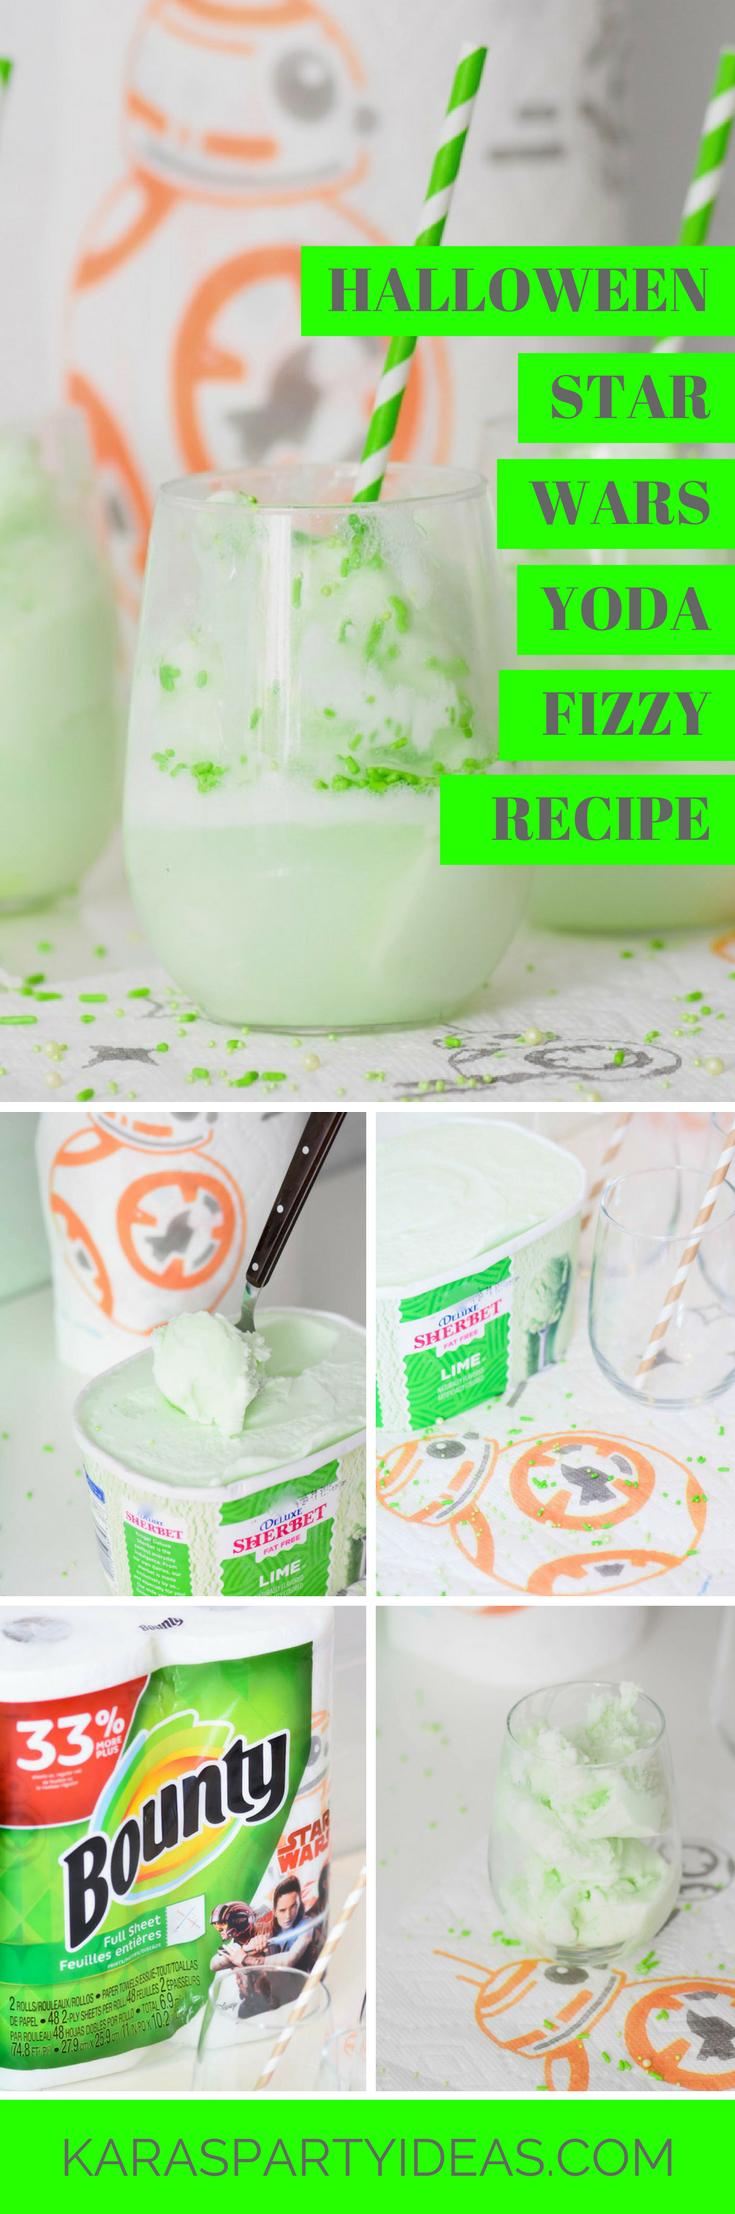 Halloween Star Wars Yoda Fizzy Recipe via Kara's Party Ideas - KarasPartyIdeas.com